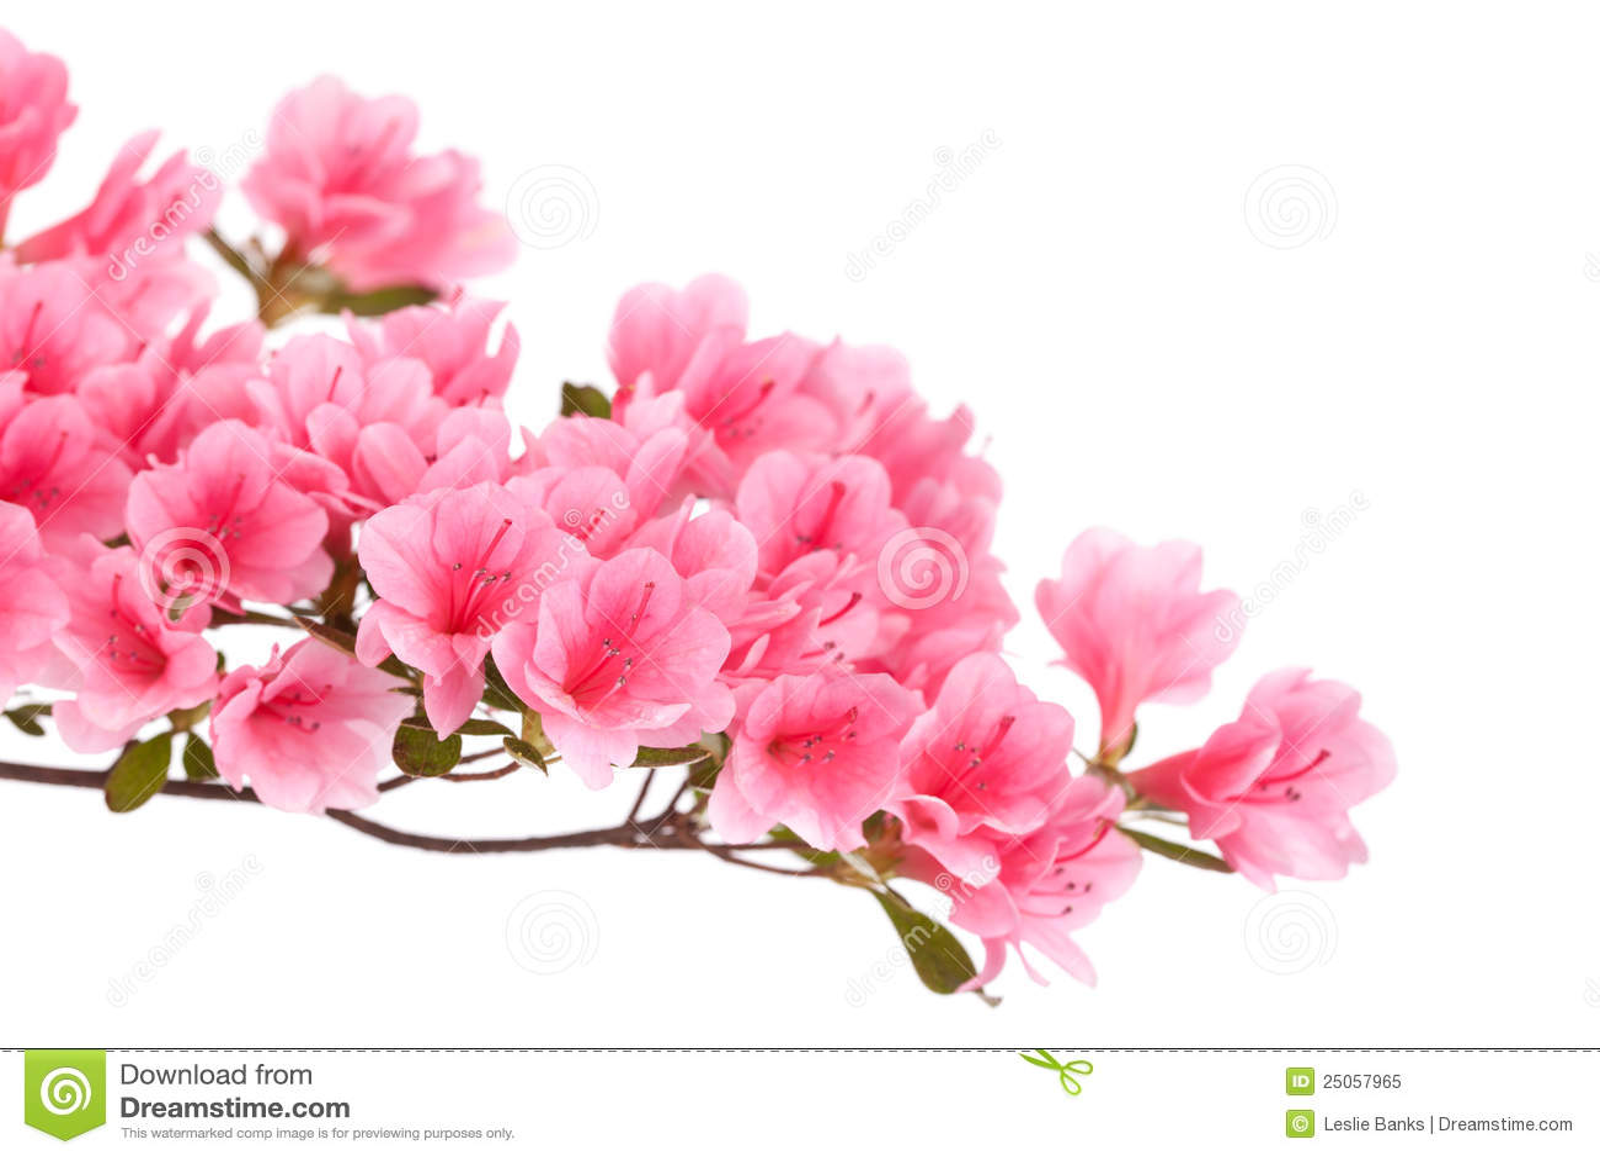 Pink Azalea Flowers Stock Image Image Of Bloom Flower 25057965